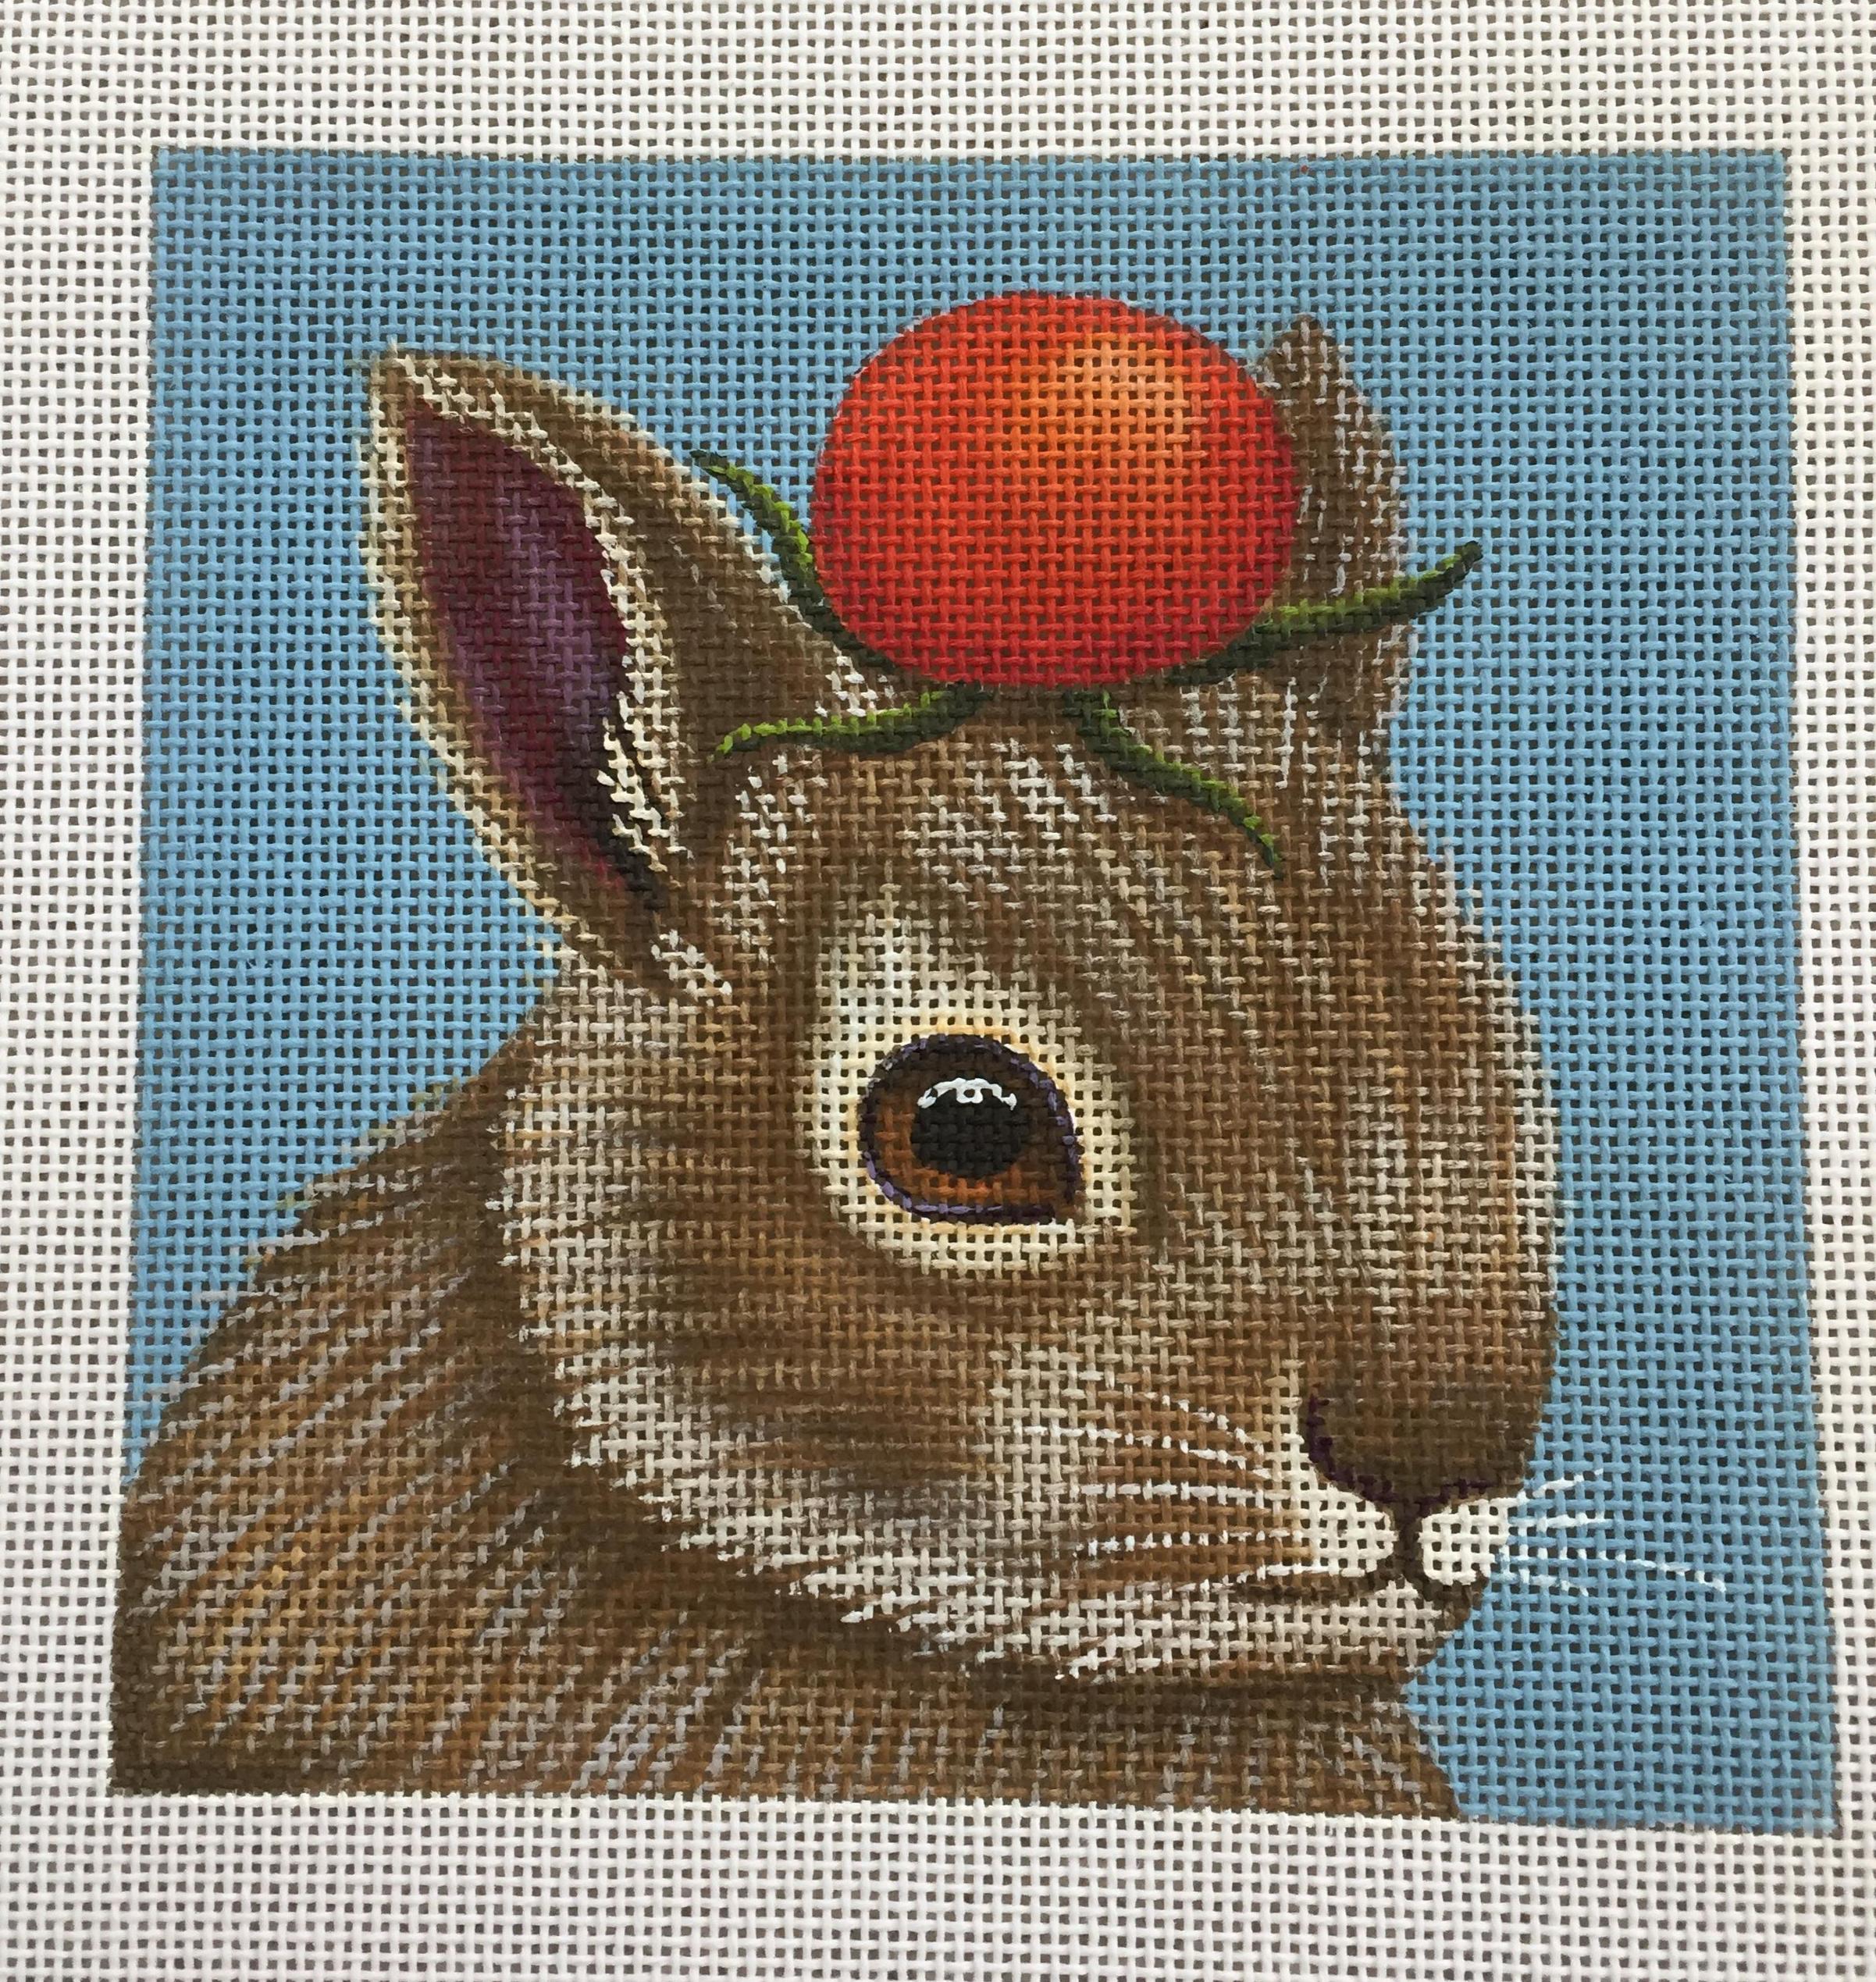 Tomato Bunny